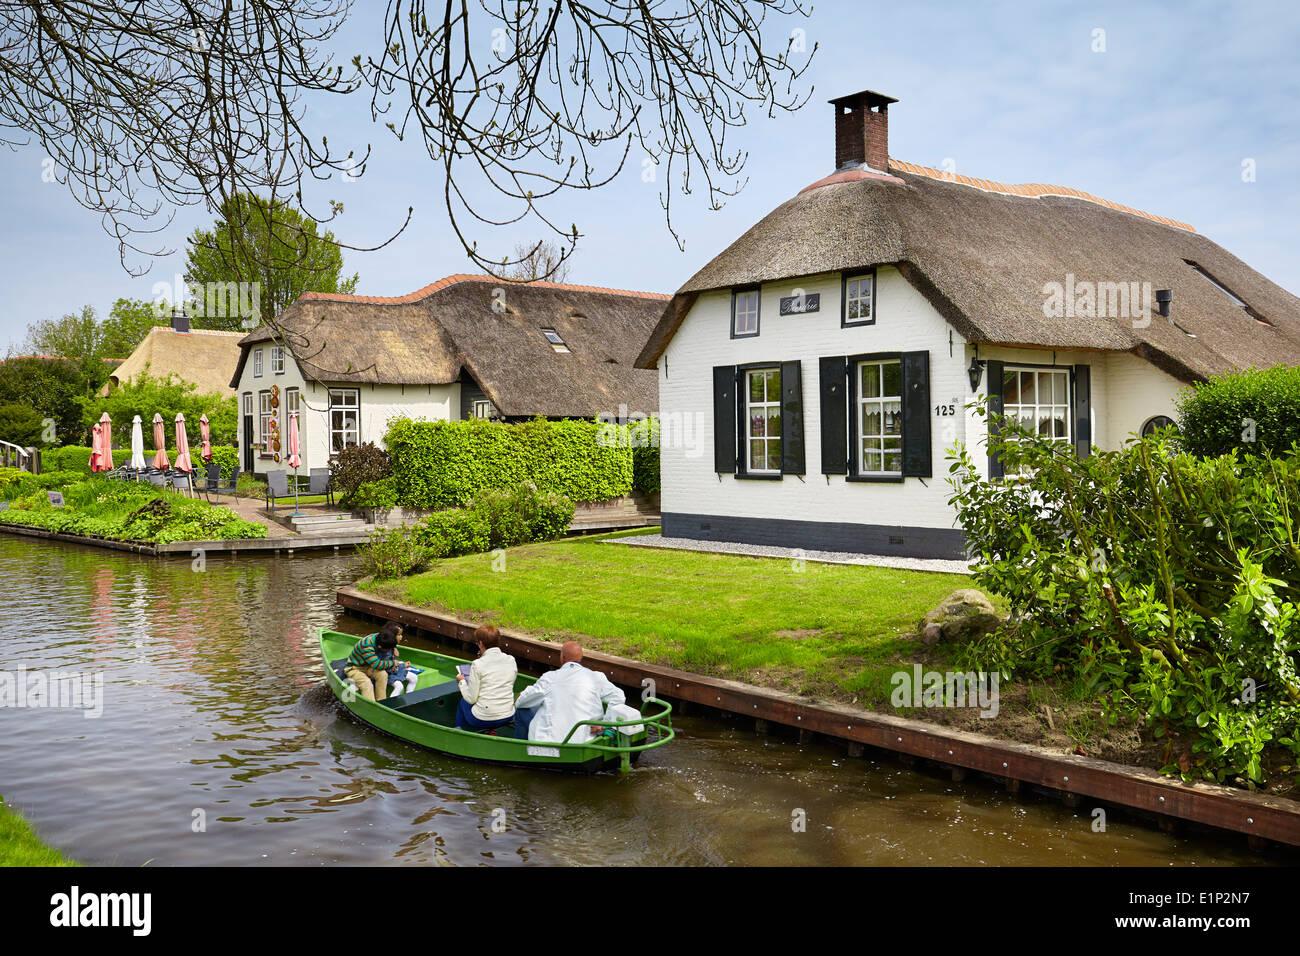 Giethoorn canal village - Holland Netherlands - Stock Image